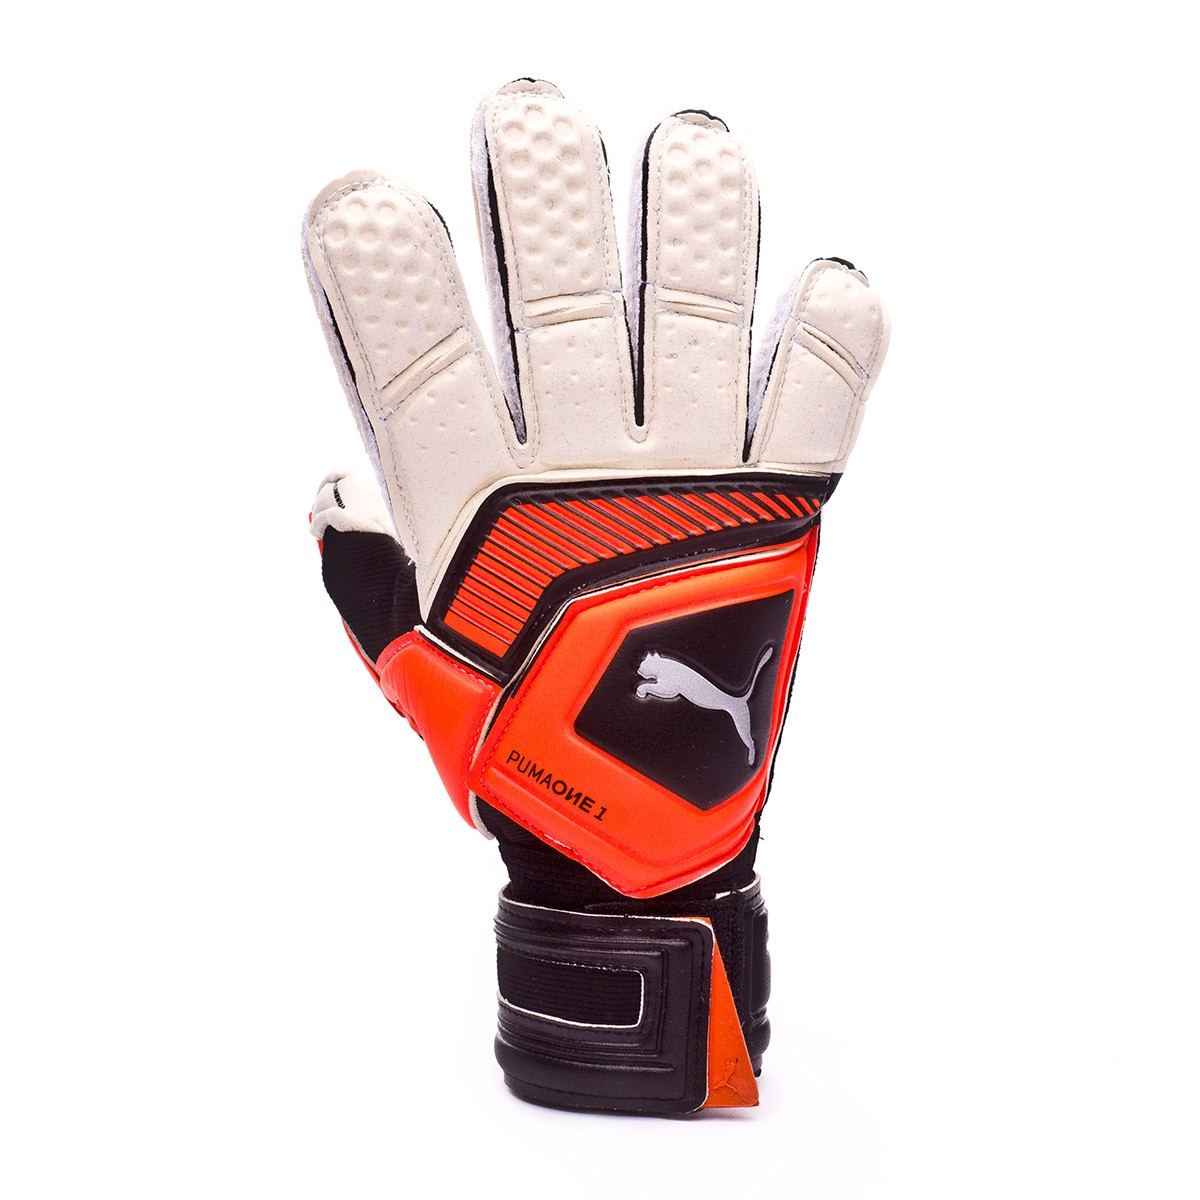 aaea25d8e4d6 Glove Puma Kids One Grip 1 RC Puma white-Shocking orange-Puma black-Silver  - Football store Fútbol Emotion